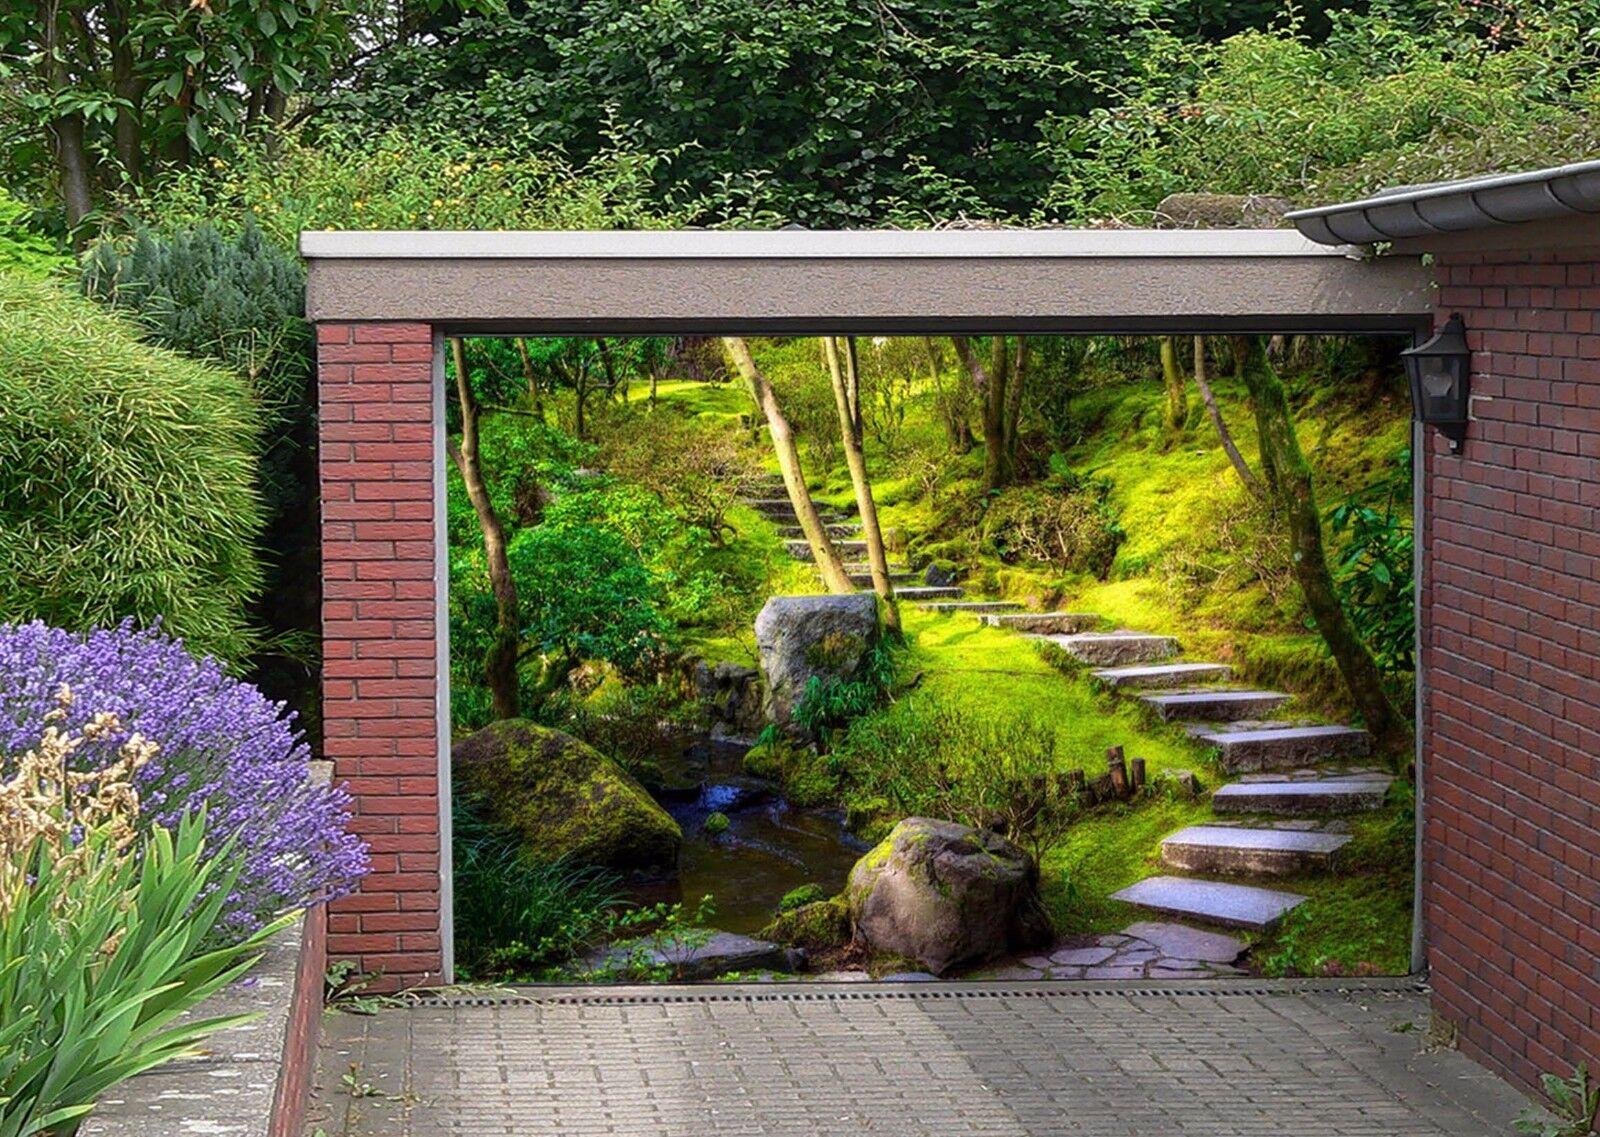 3D Stone Jungle 8 Garage Door Murals Wall Print Decal Wall AJ WALLPAPER UK Carly